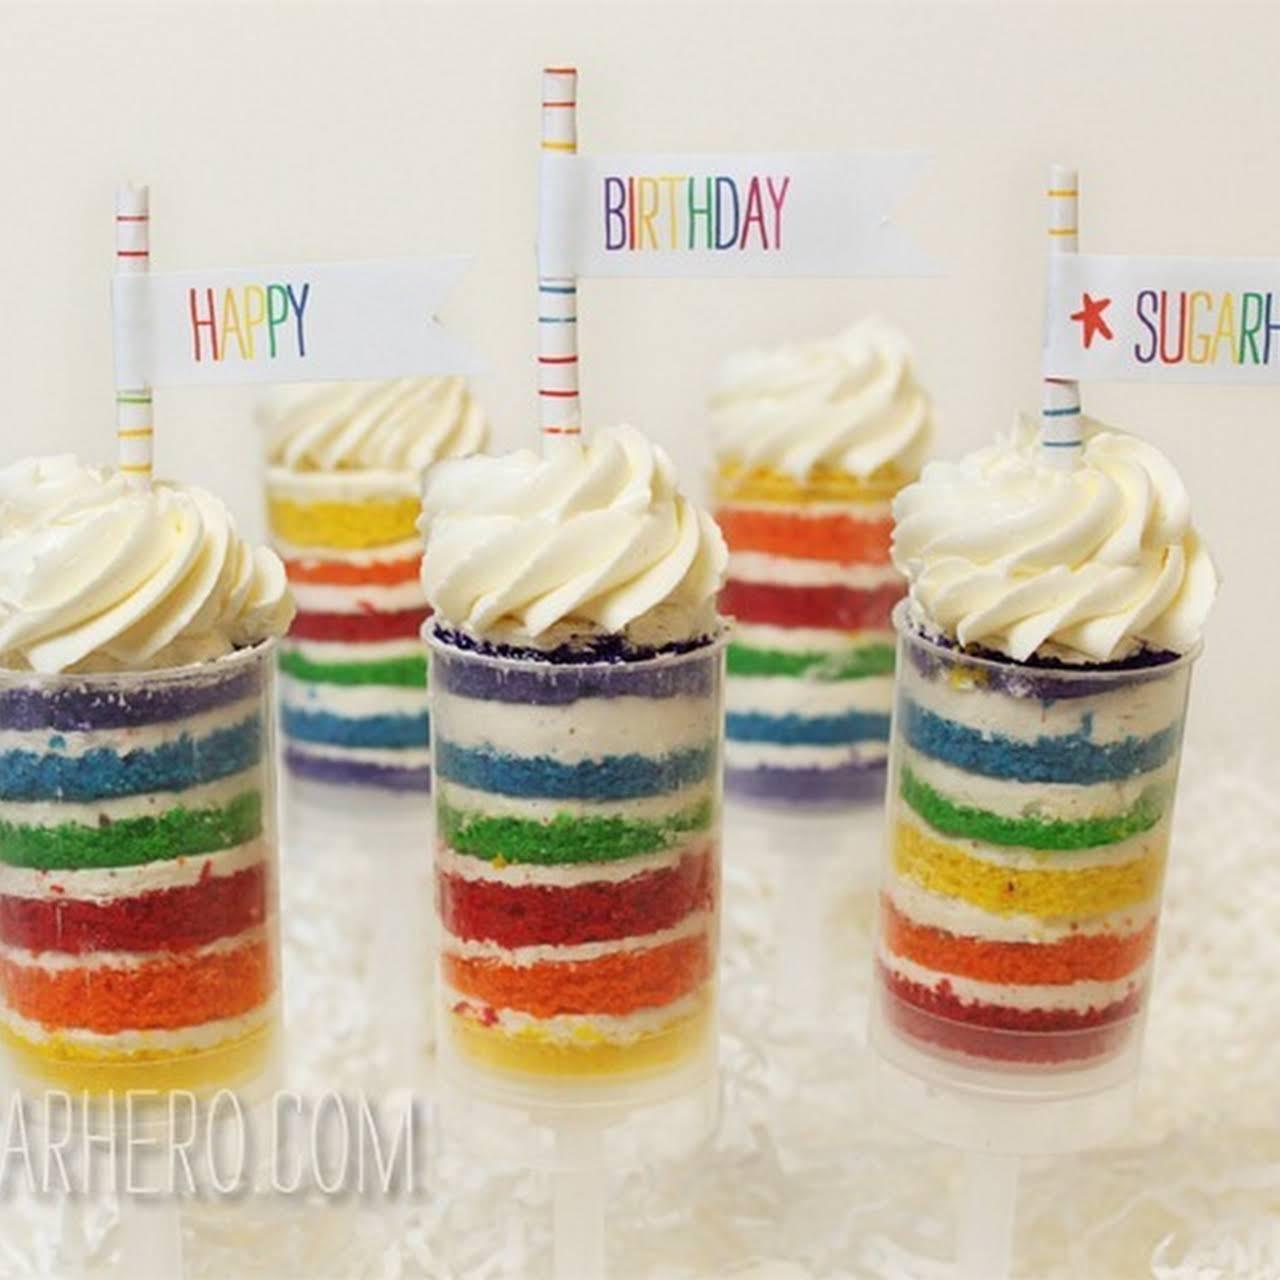 Rainbow Cake Push-Up Pops